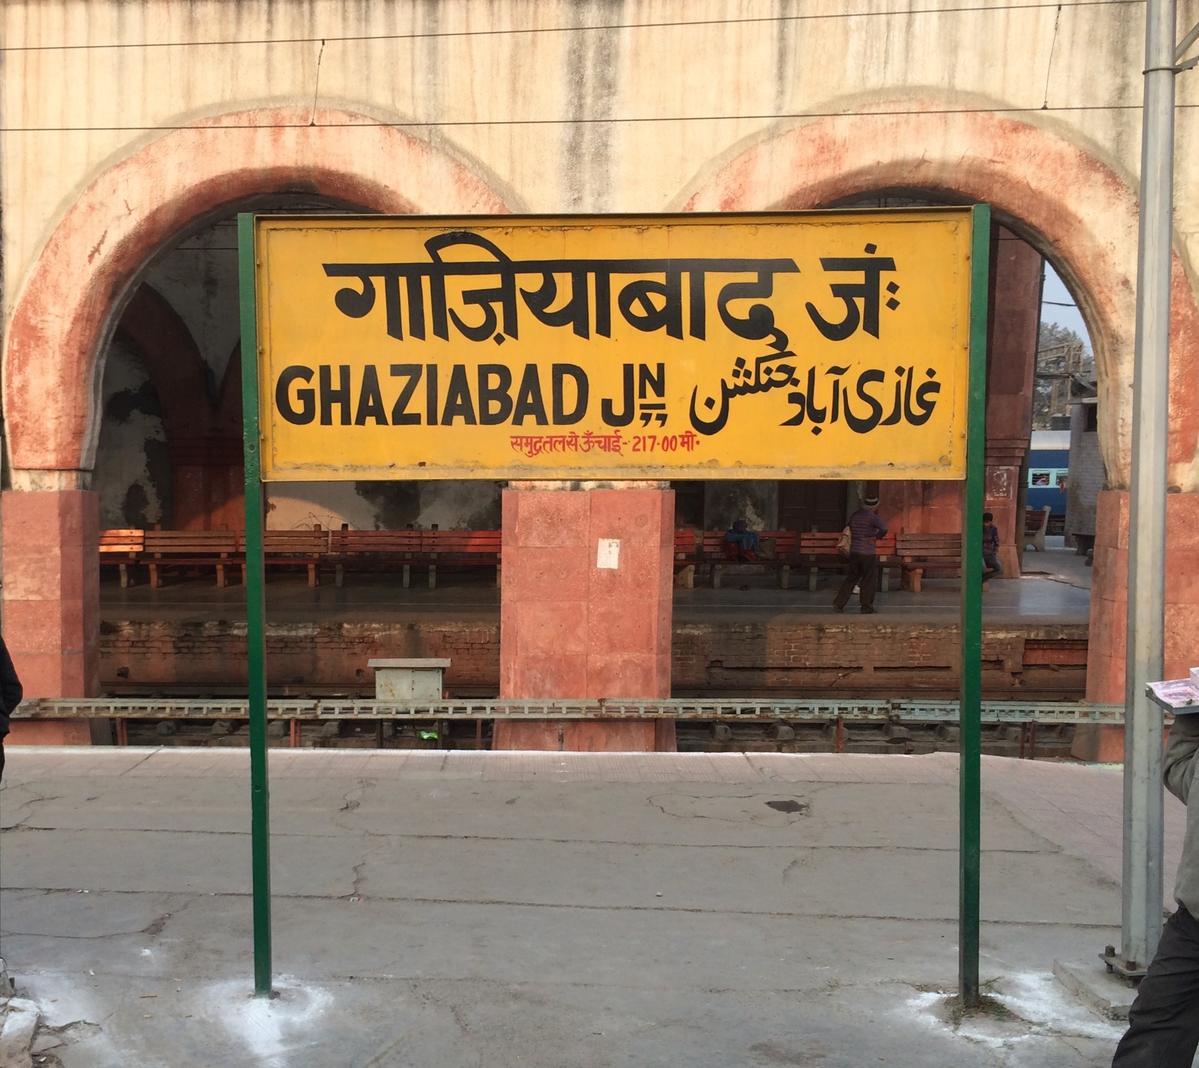 सेक्स क्लिनिक ग़ज़िआबाद| Sex Clinic in Ghaziabad